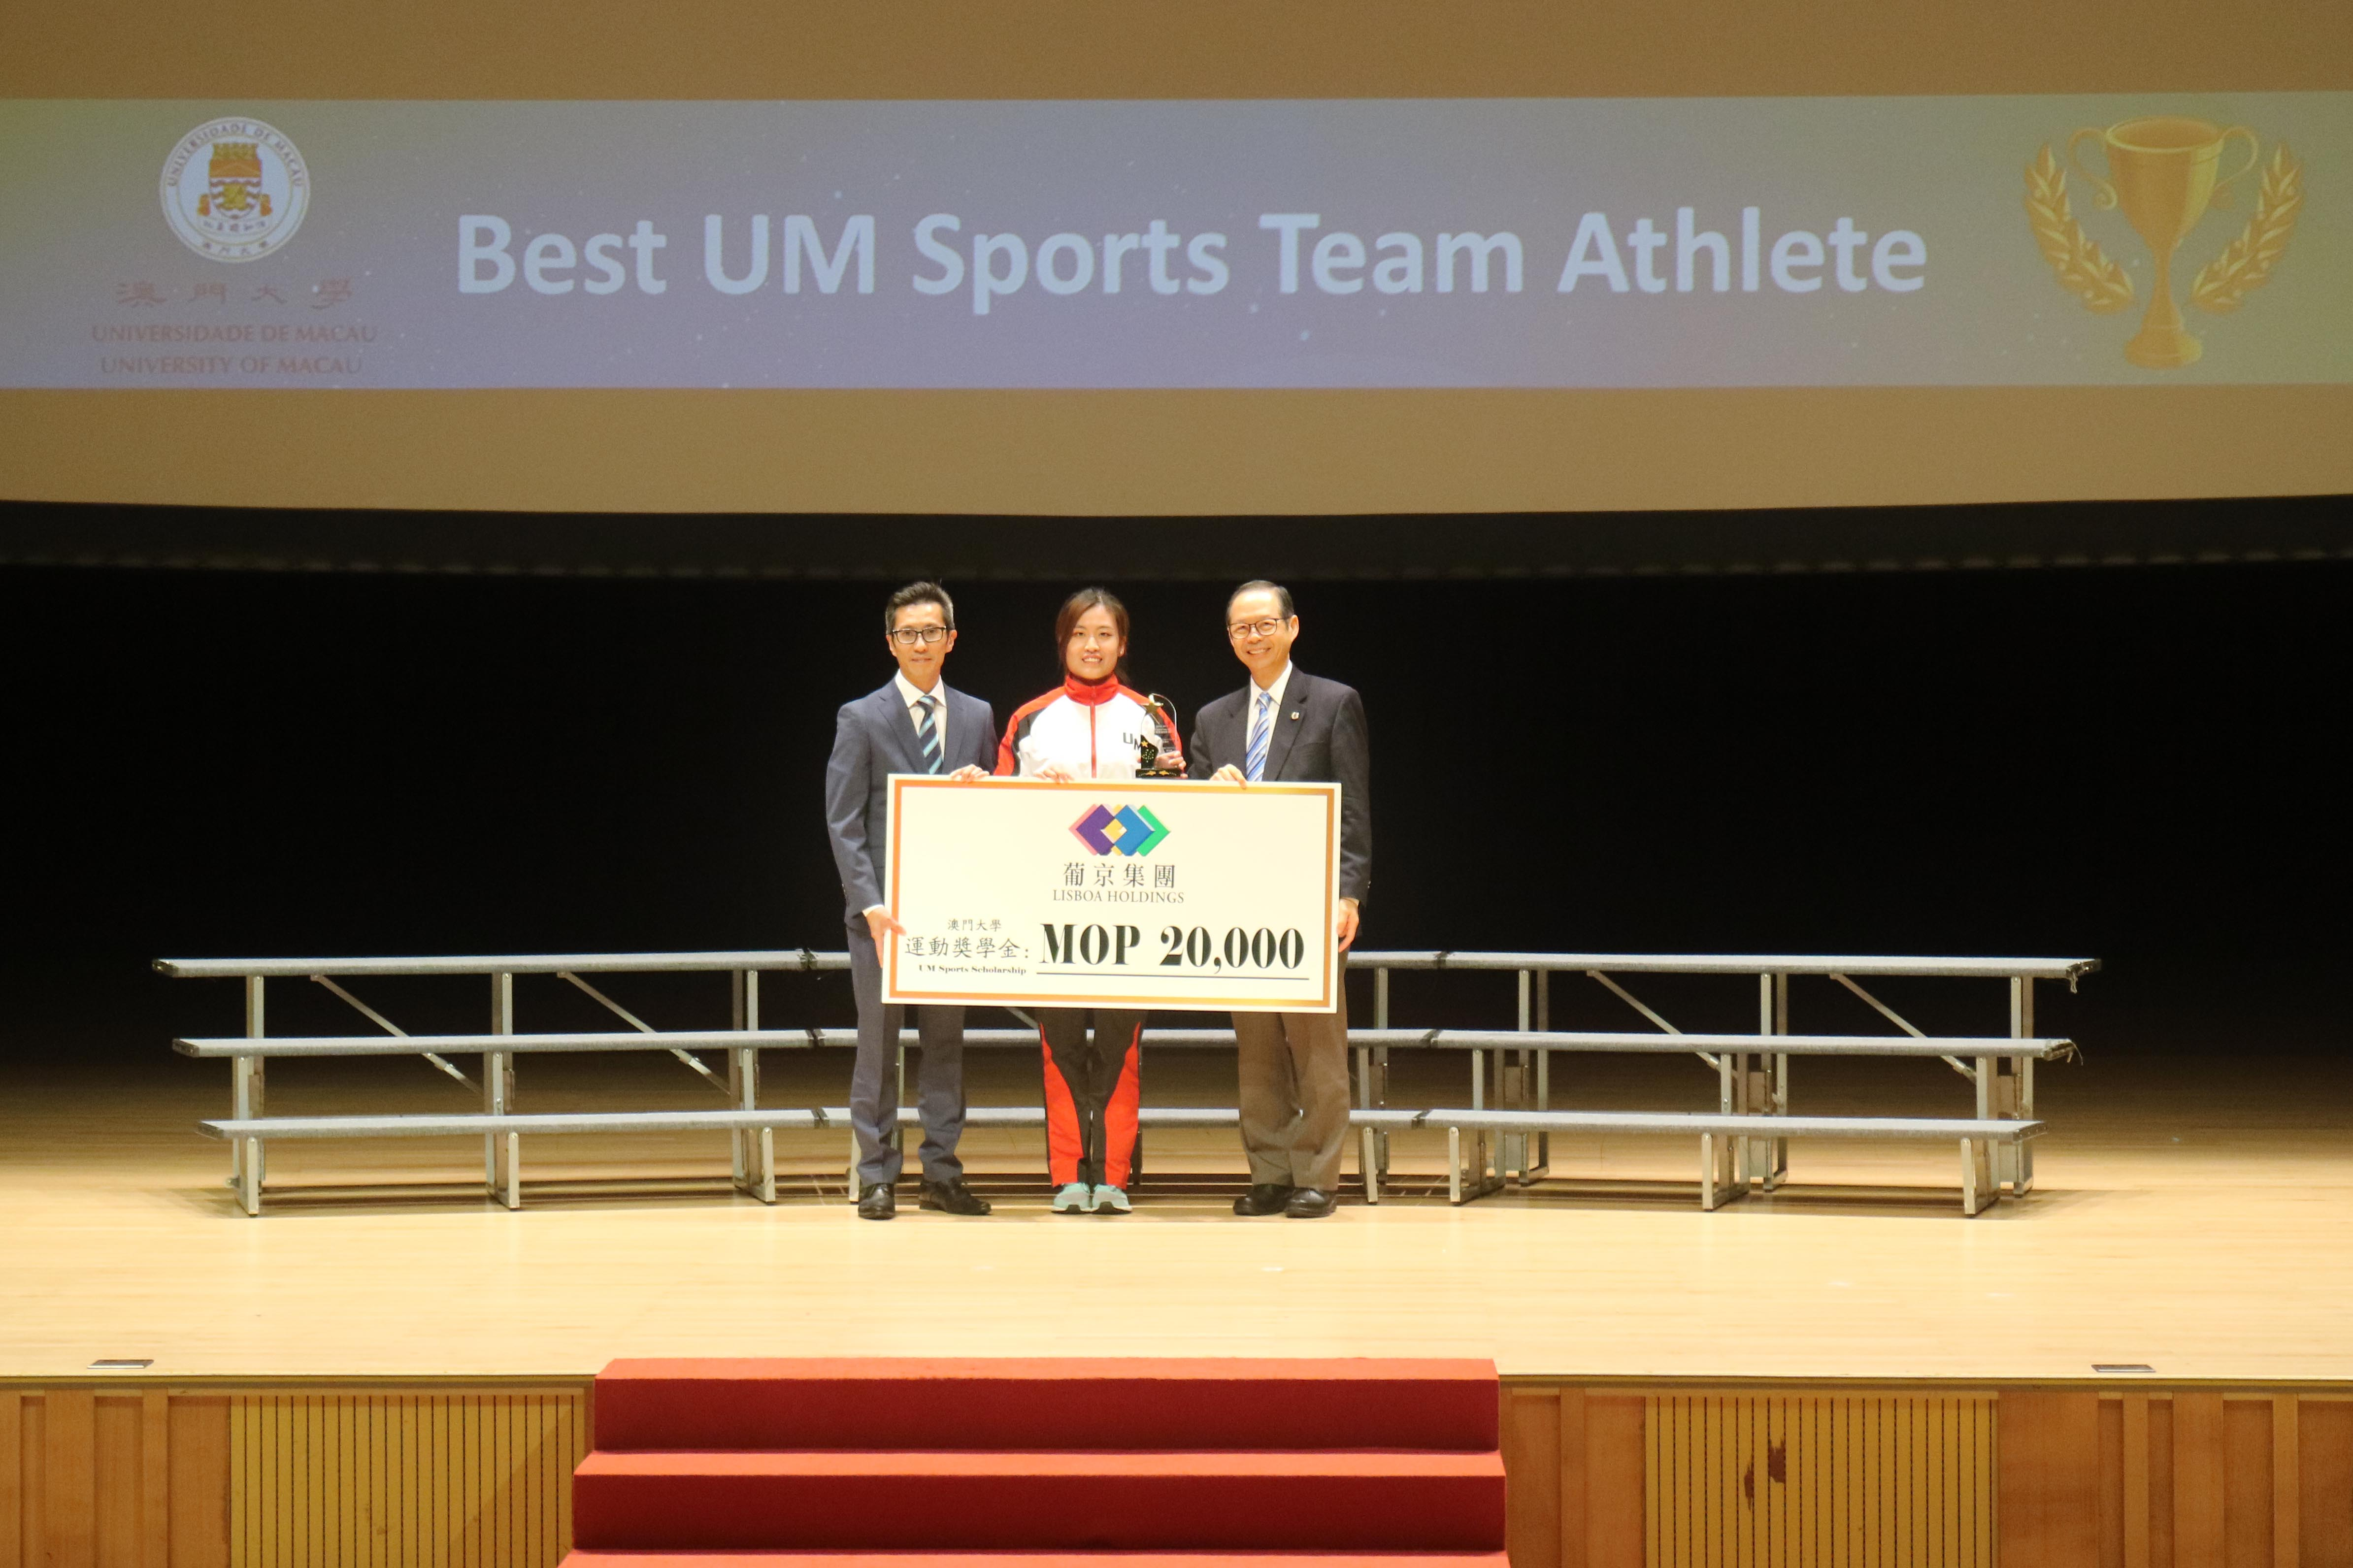 A student receives the Best UM Sports Team Athlete Scholarship